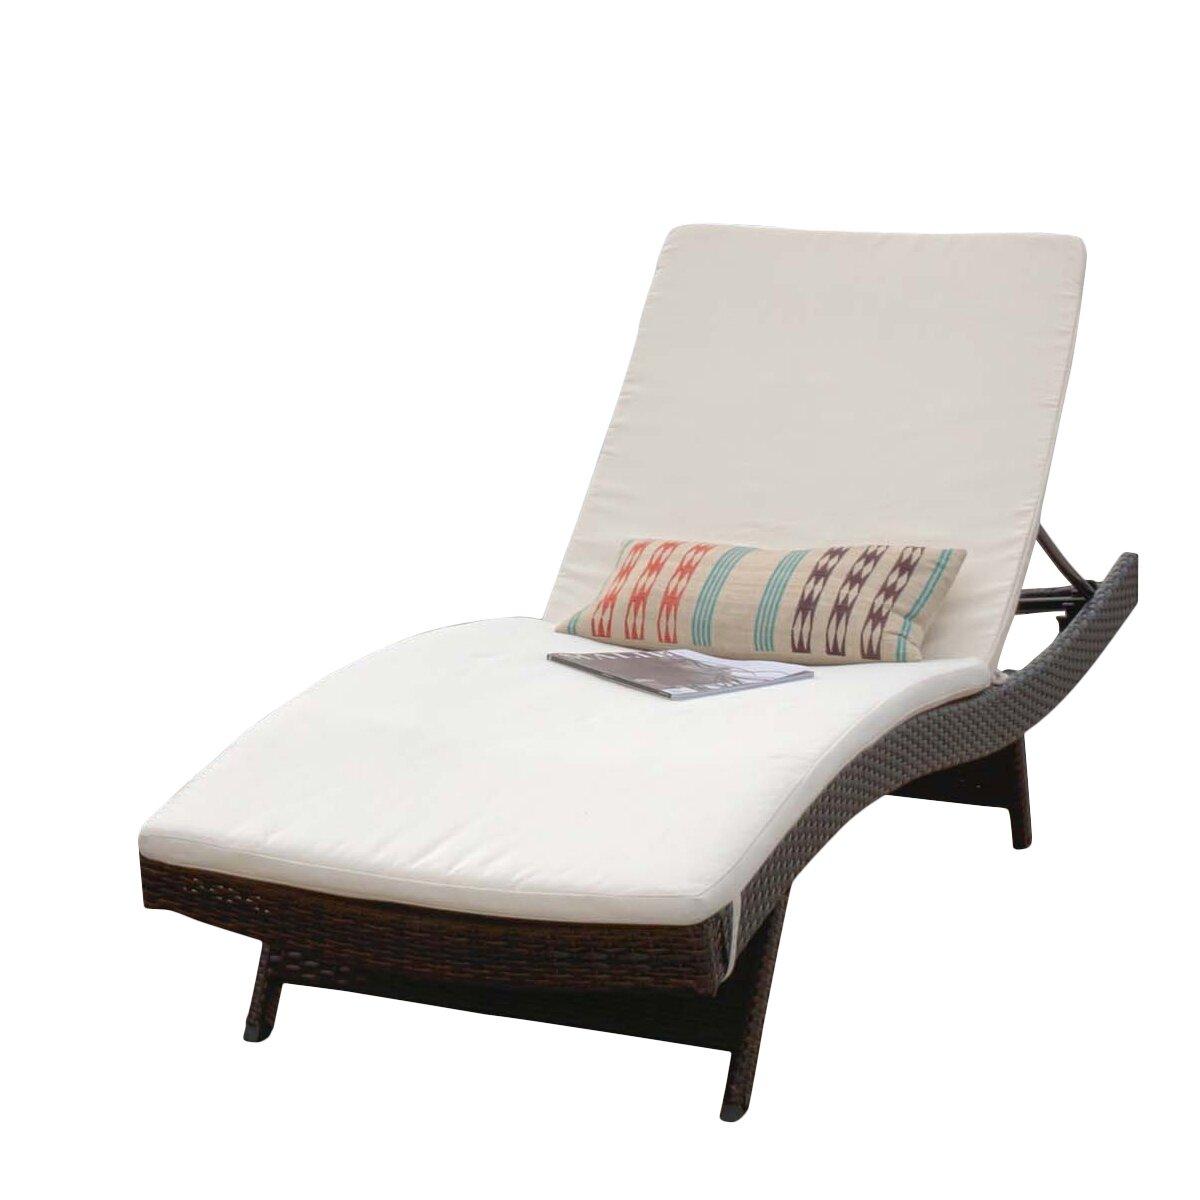 Home Loft Concepts Outdoor Sunbrella Chaise Lounge Cushion